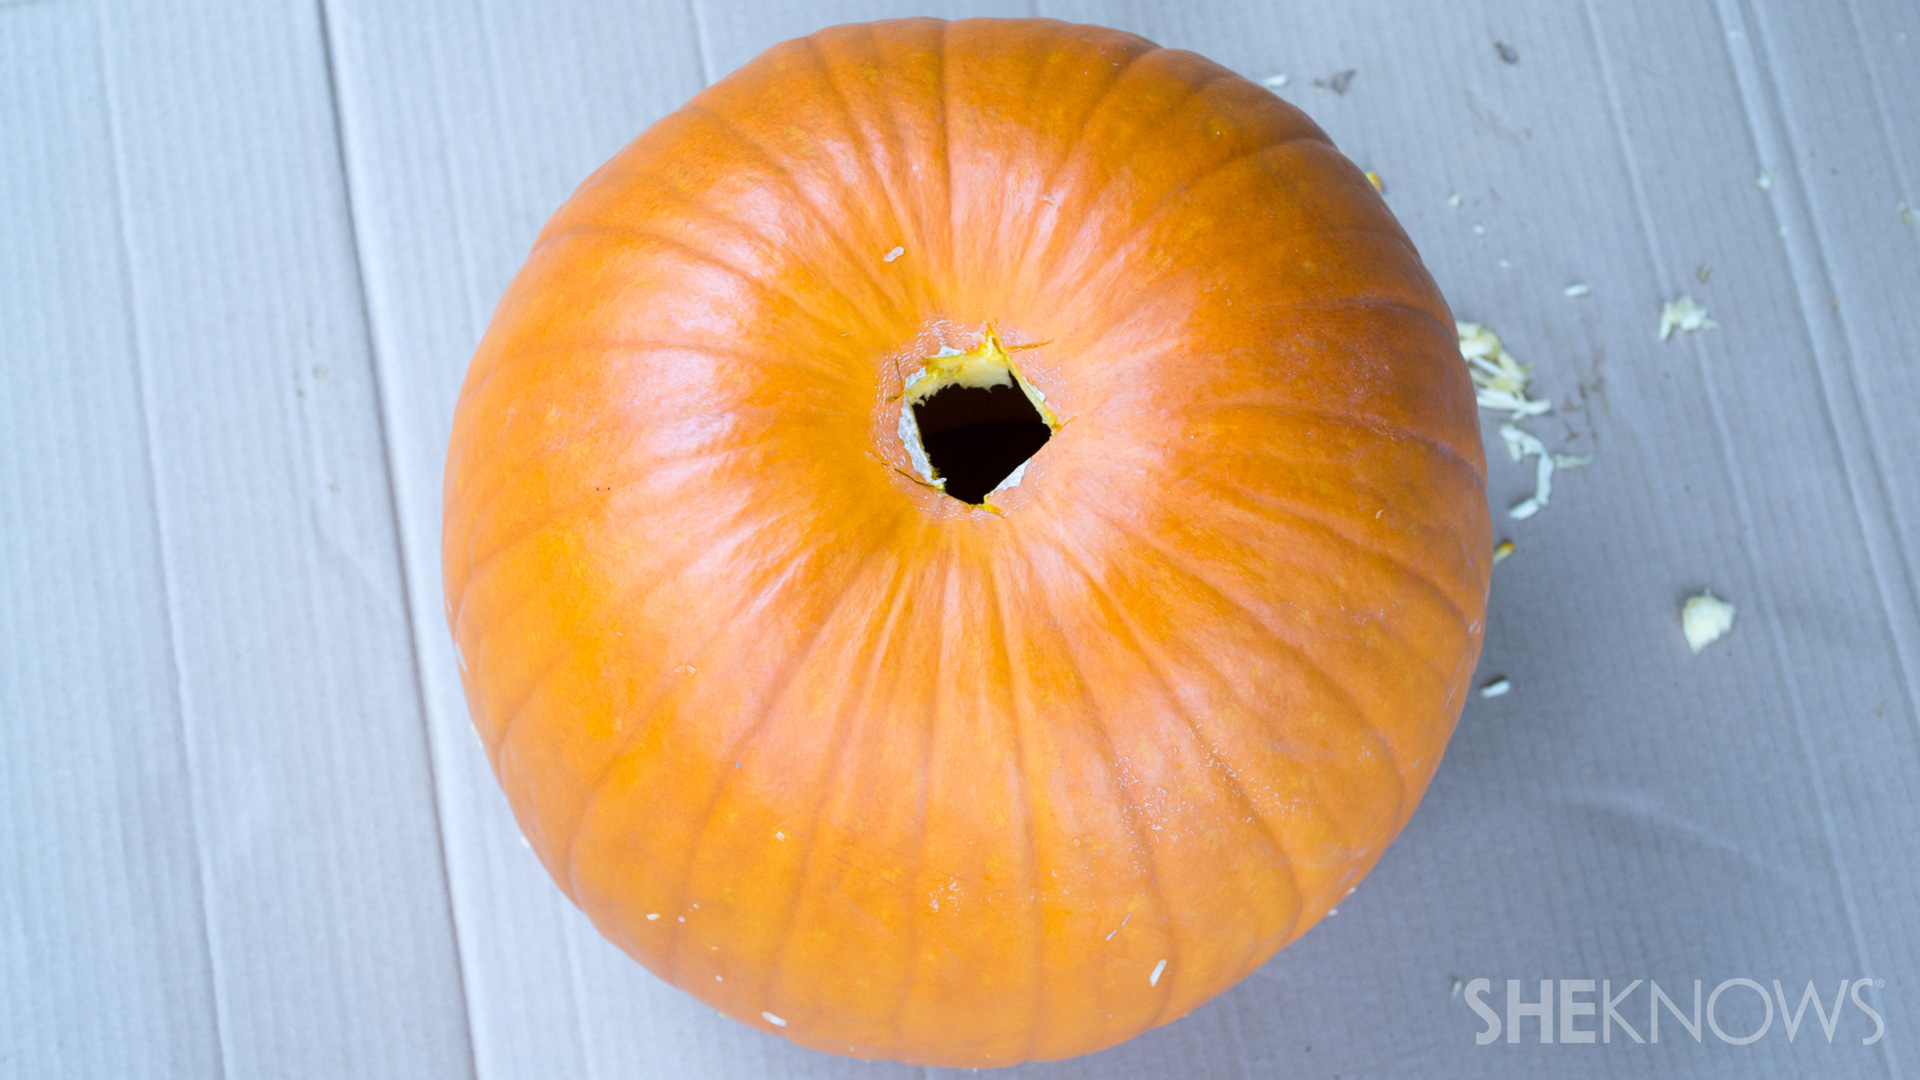 DIY Pumpkin planter: add drainage holes